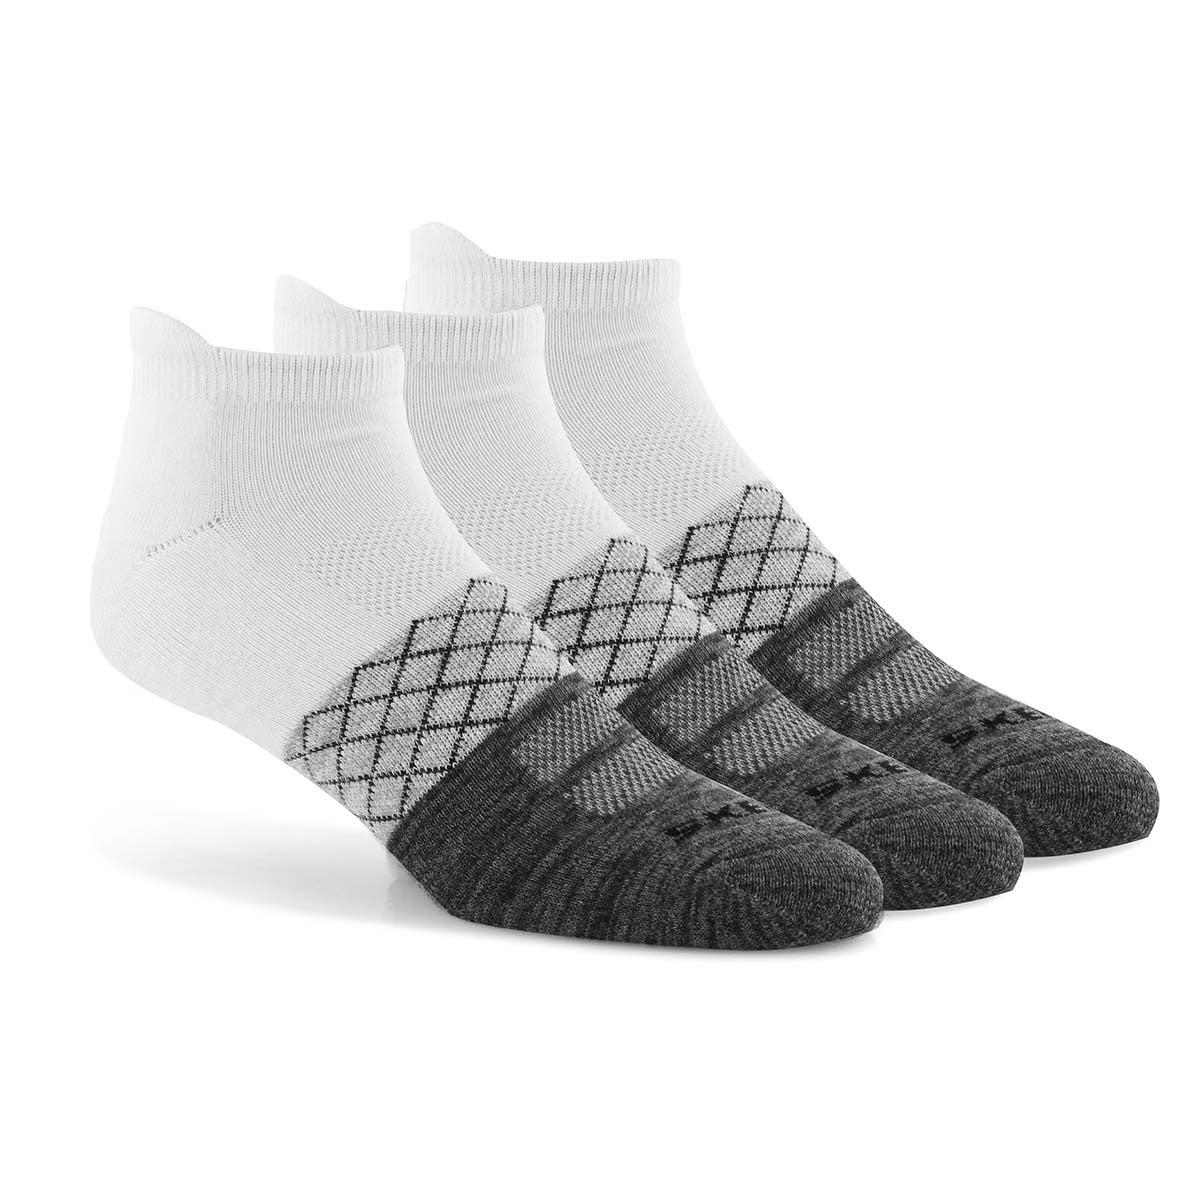 Mns Low Cut Half Terry wht/gry socks 3pk